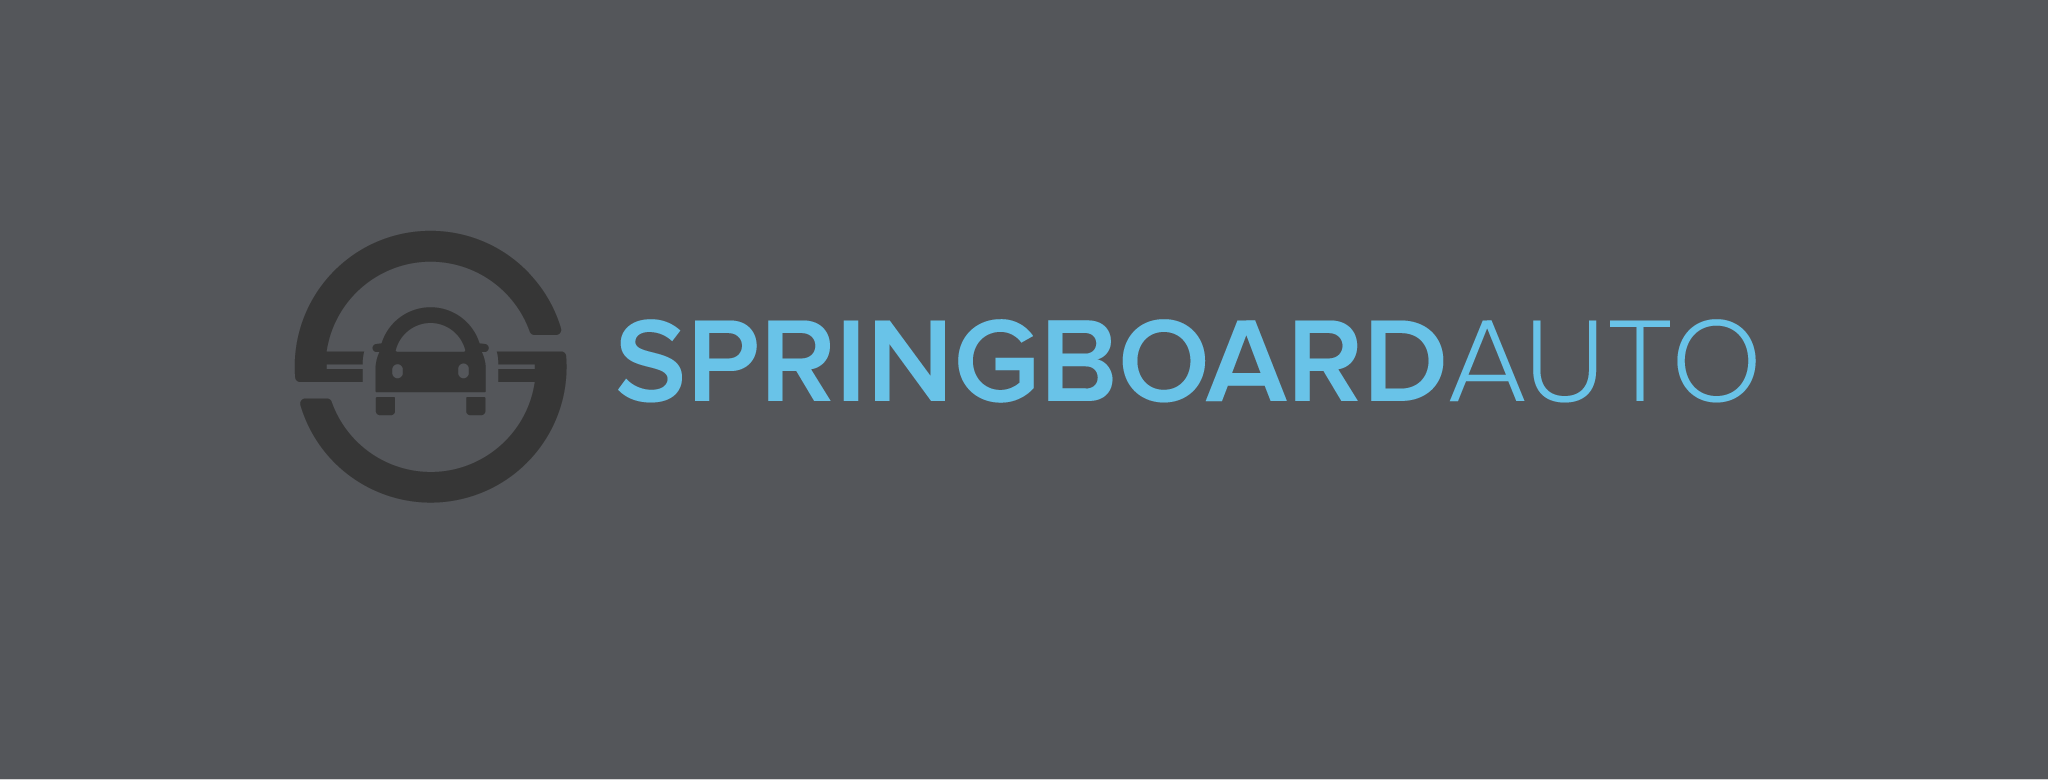 SpringboardAuto reviews | Financial Services at 46 Discovery - Irvine CA